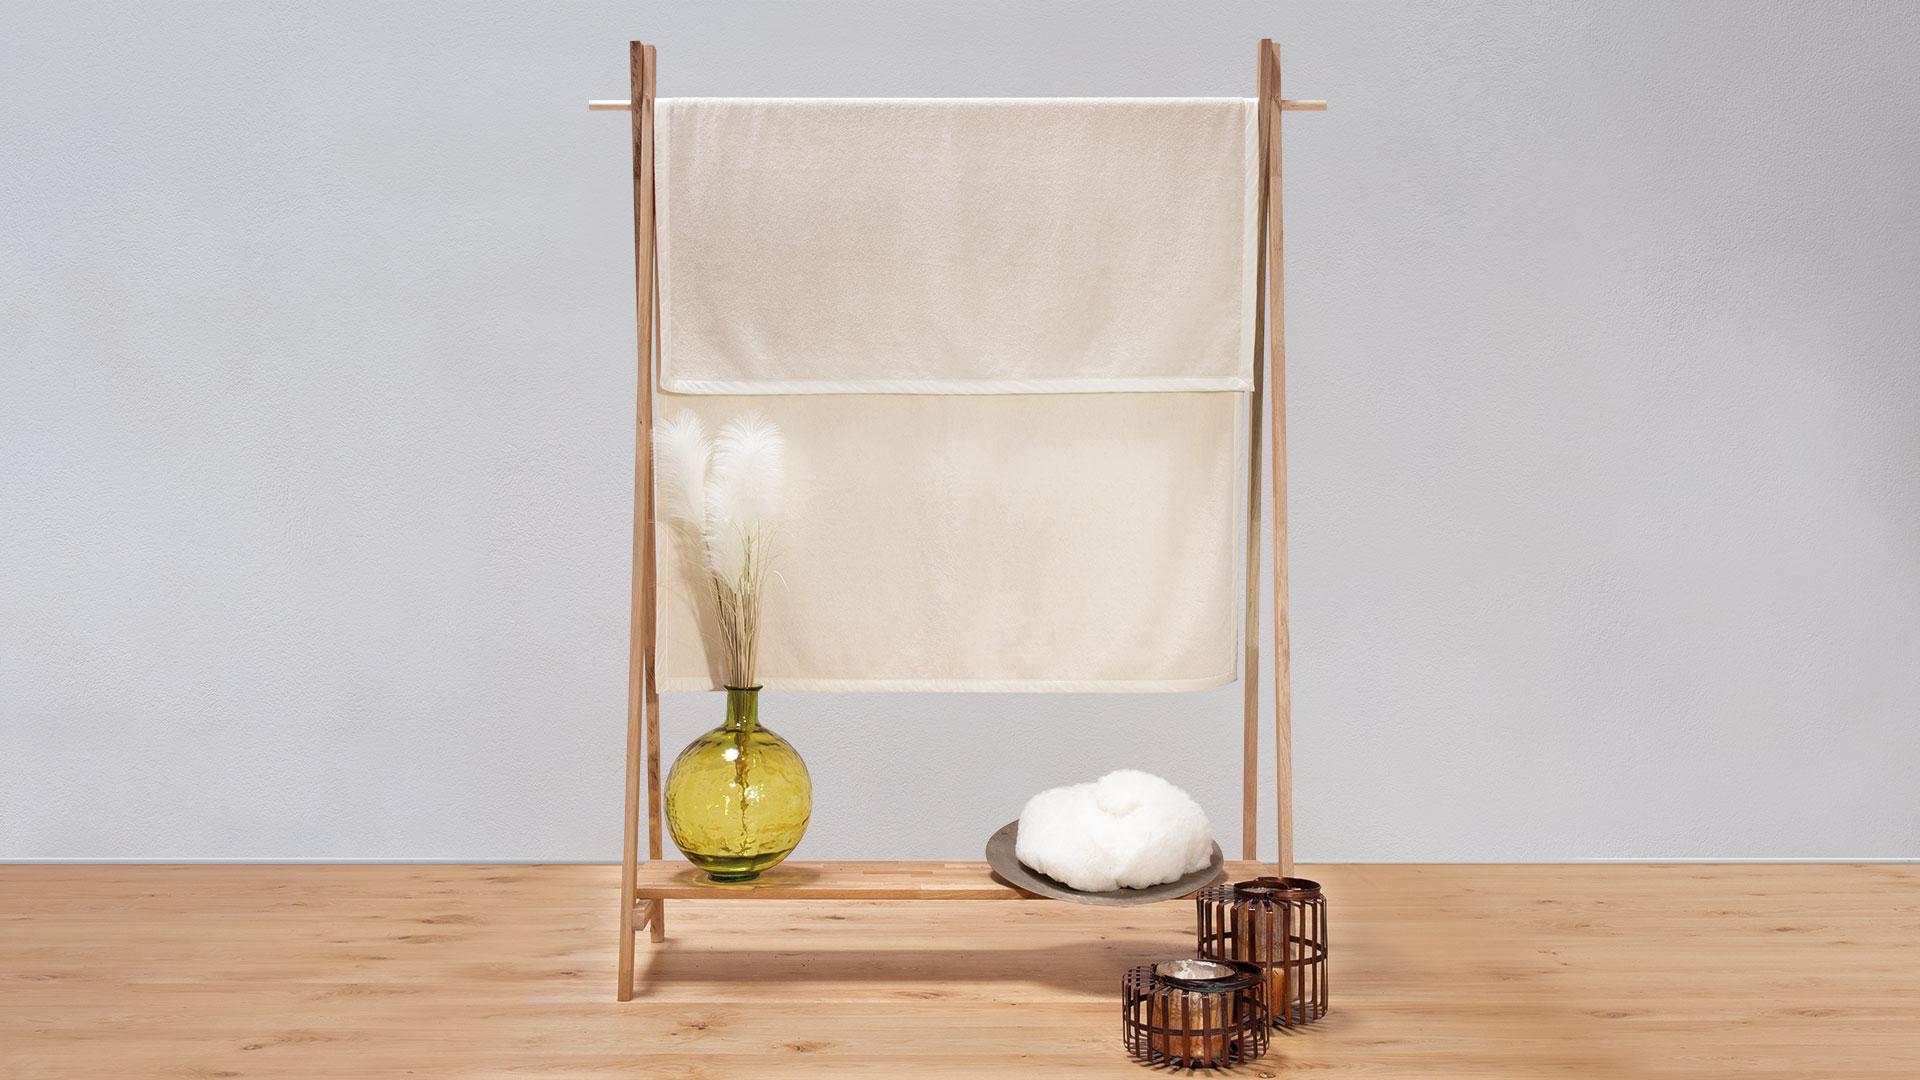 sommerbettdecke nido baumwollfrottier leicht bettdecke. Black Bedroom Furniture Sets. Home Design Ideas